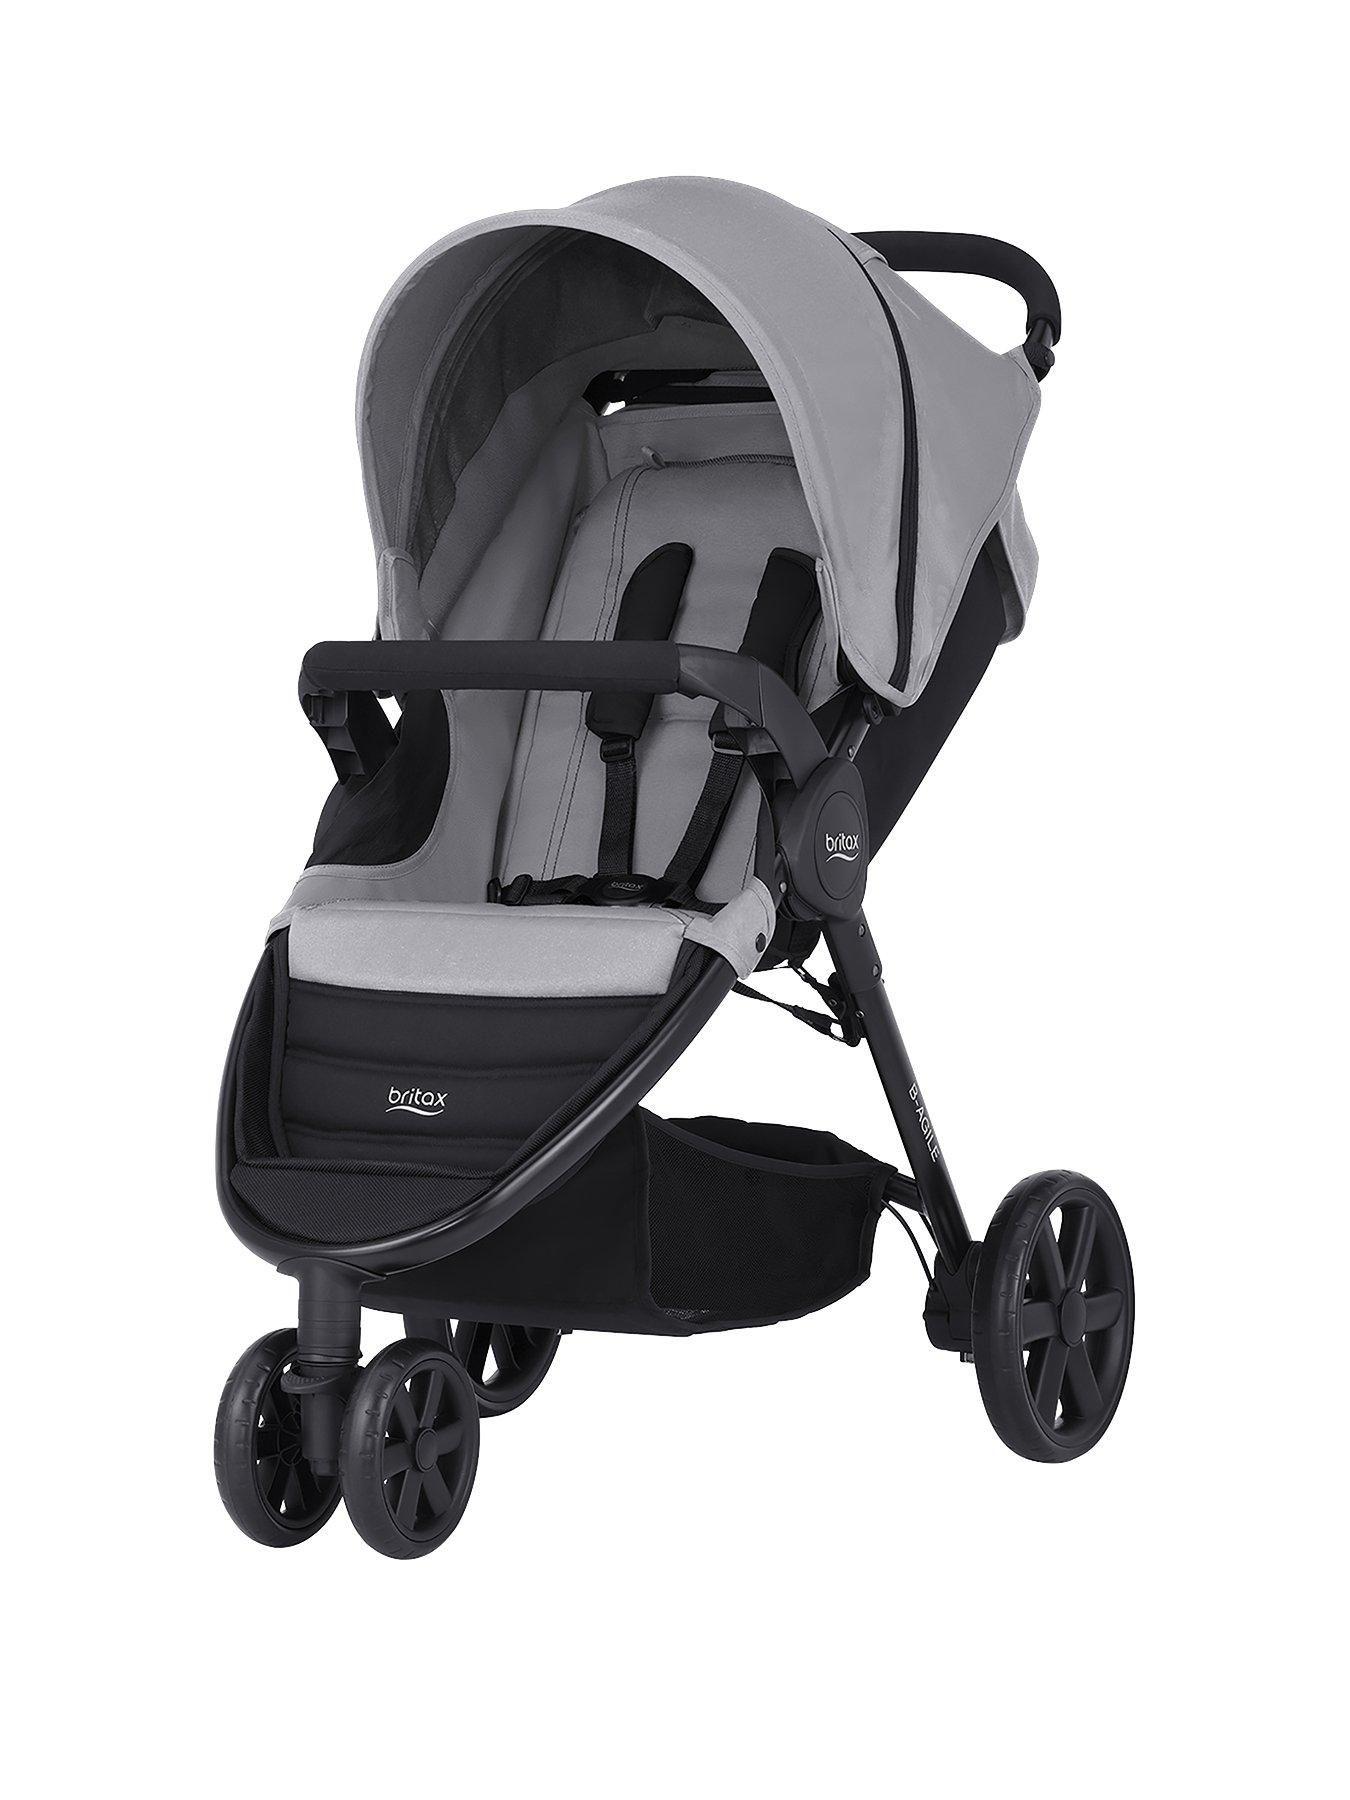 BAGILE 3 Pushchair Britax b agile, Britax stroller, Prams